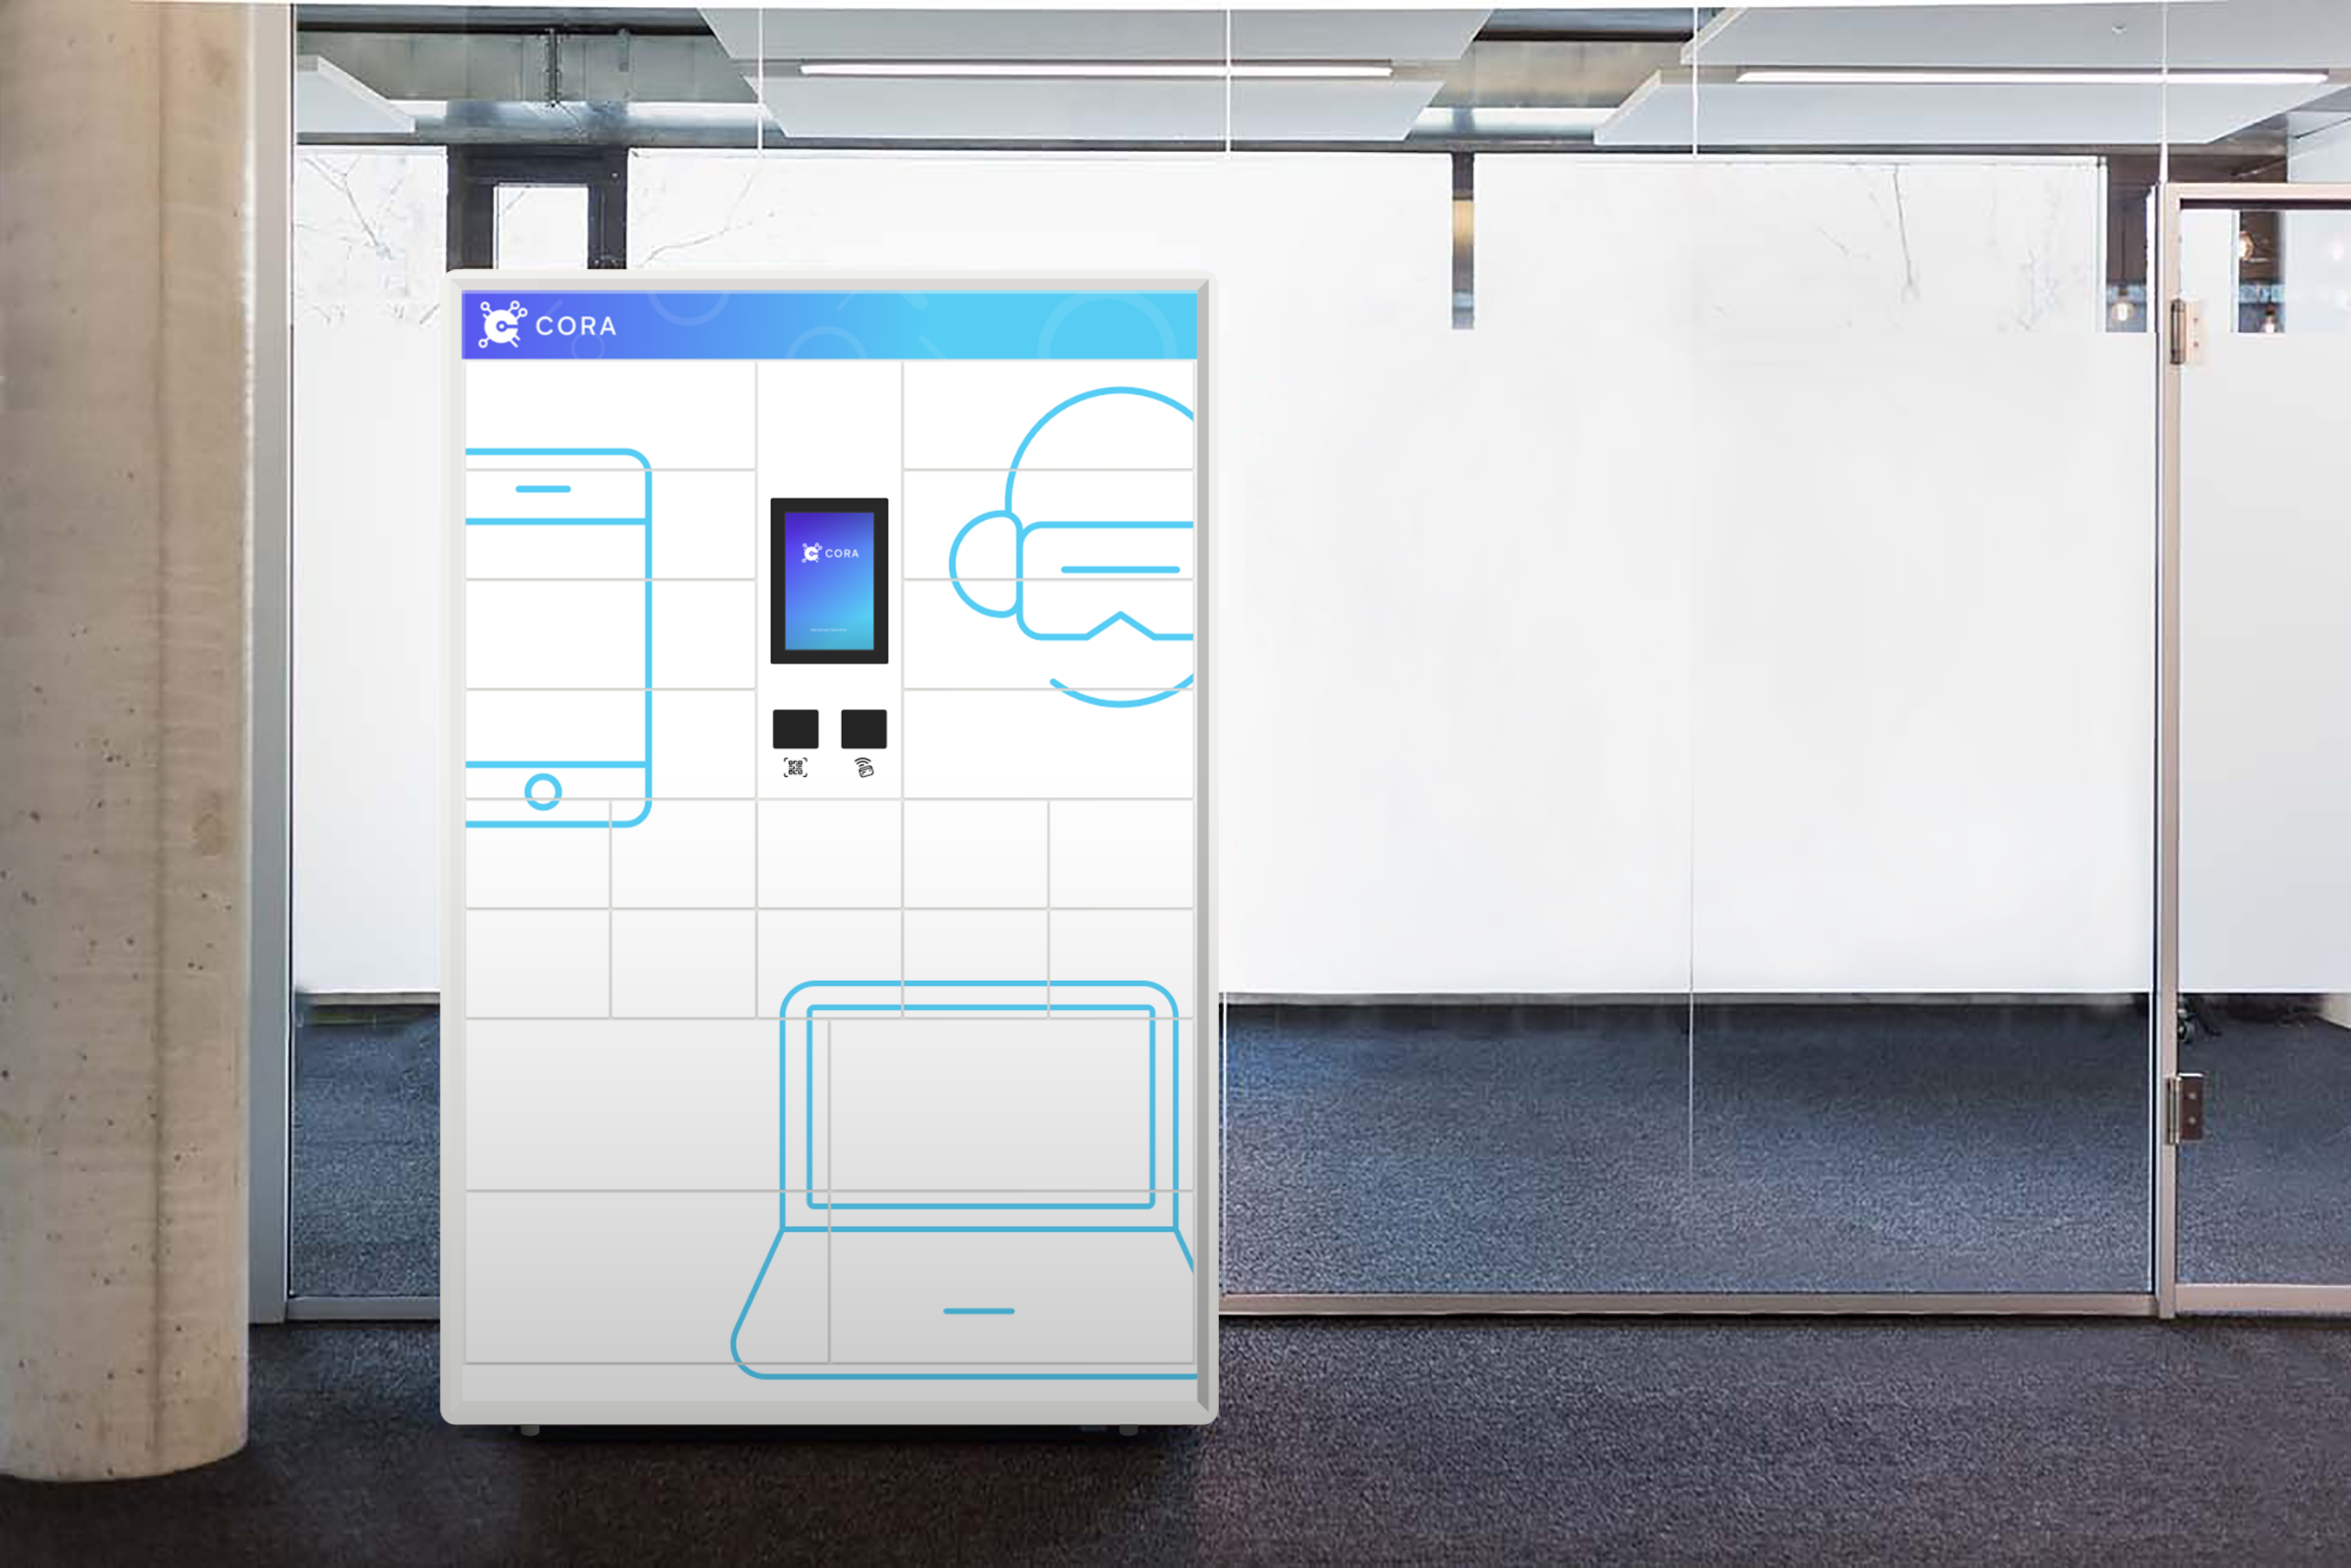 PIDAS lanciert neueste Generation des IT-Automaten «CORA»